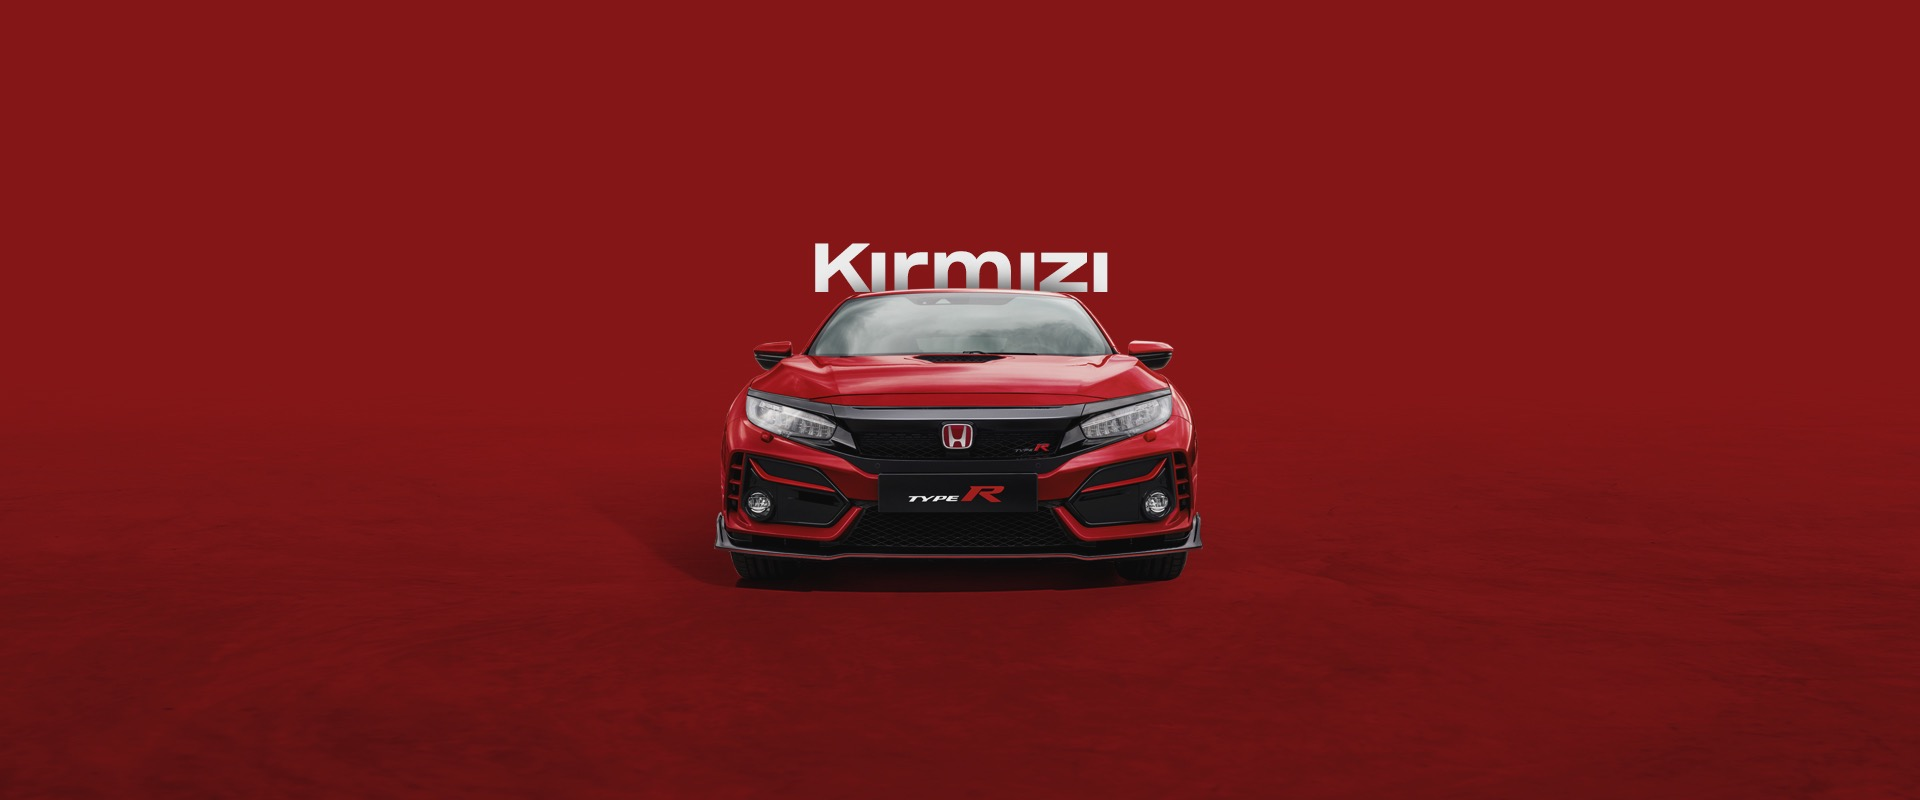 Honda Plaza  Şen Kırmızı